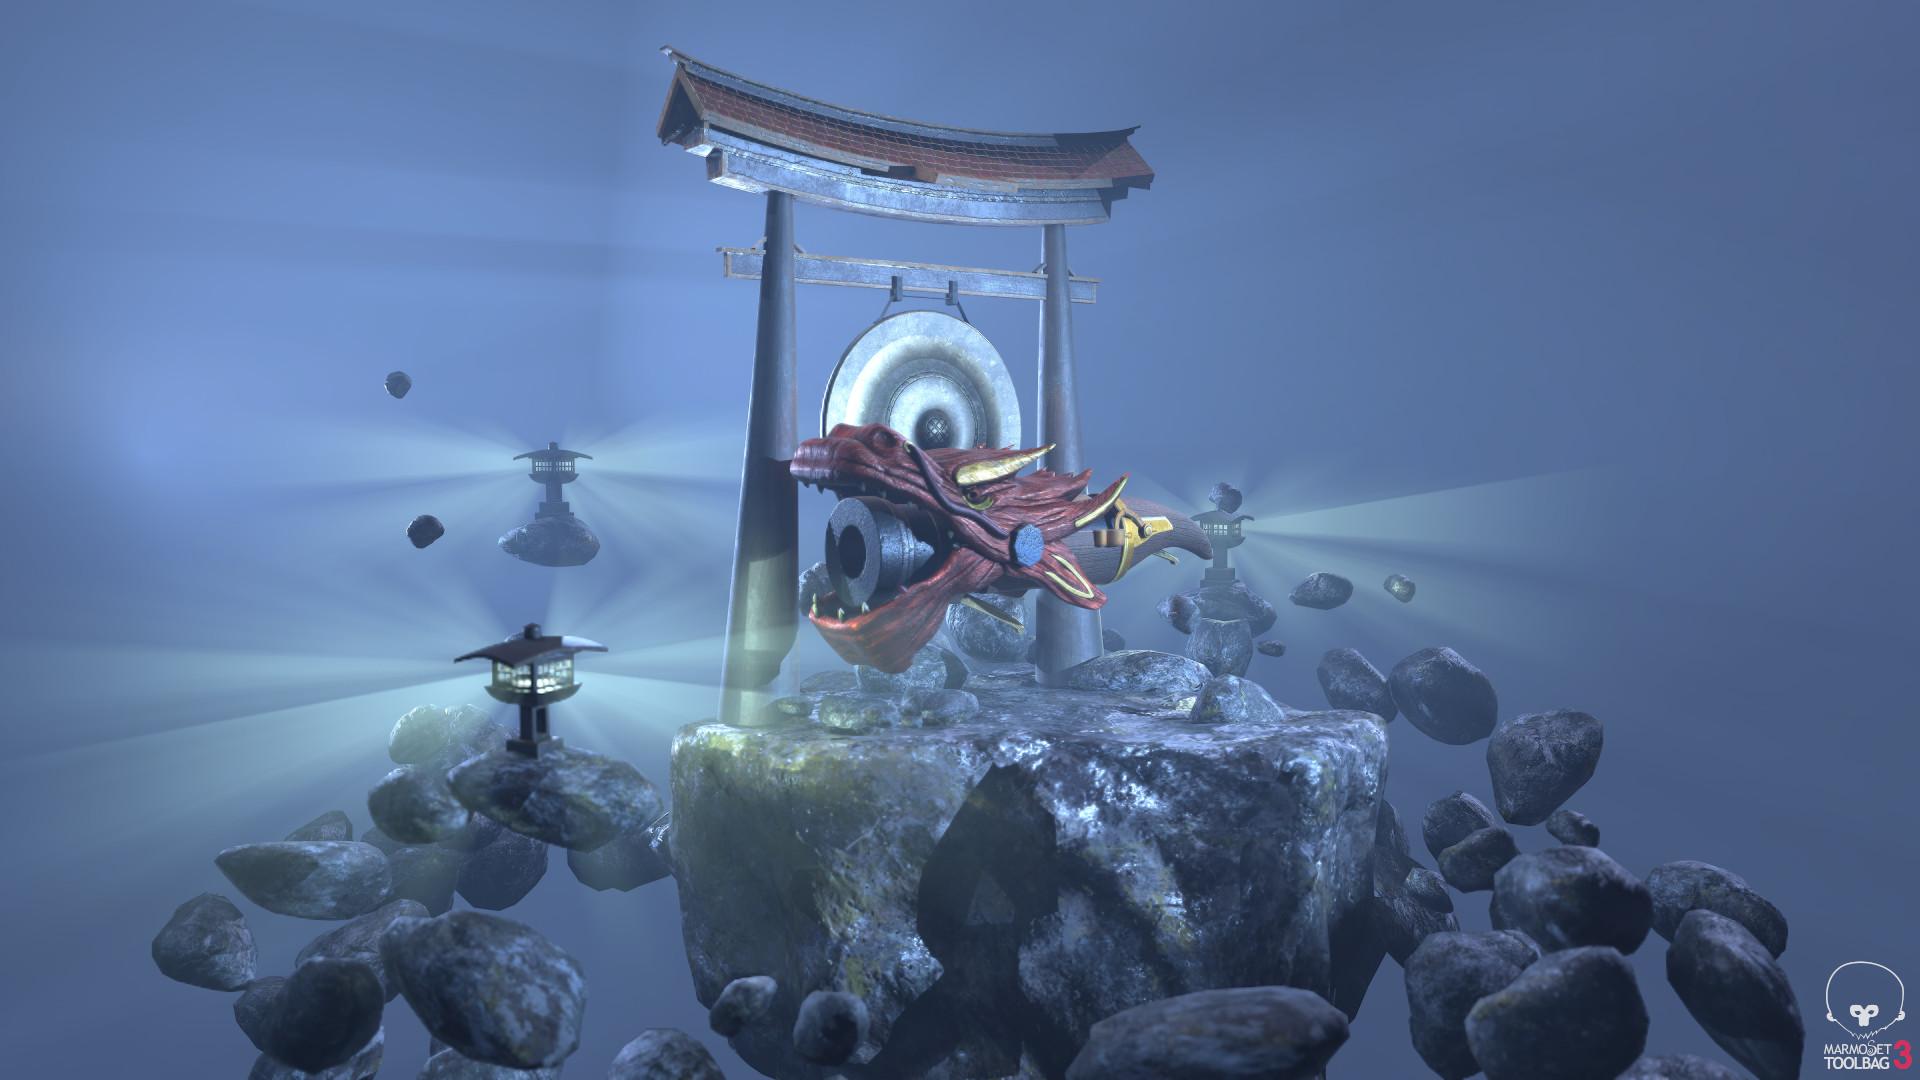 Marmoset: Dragon Tanegashima with scene